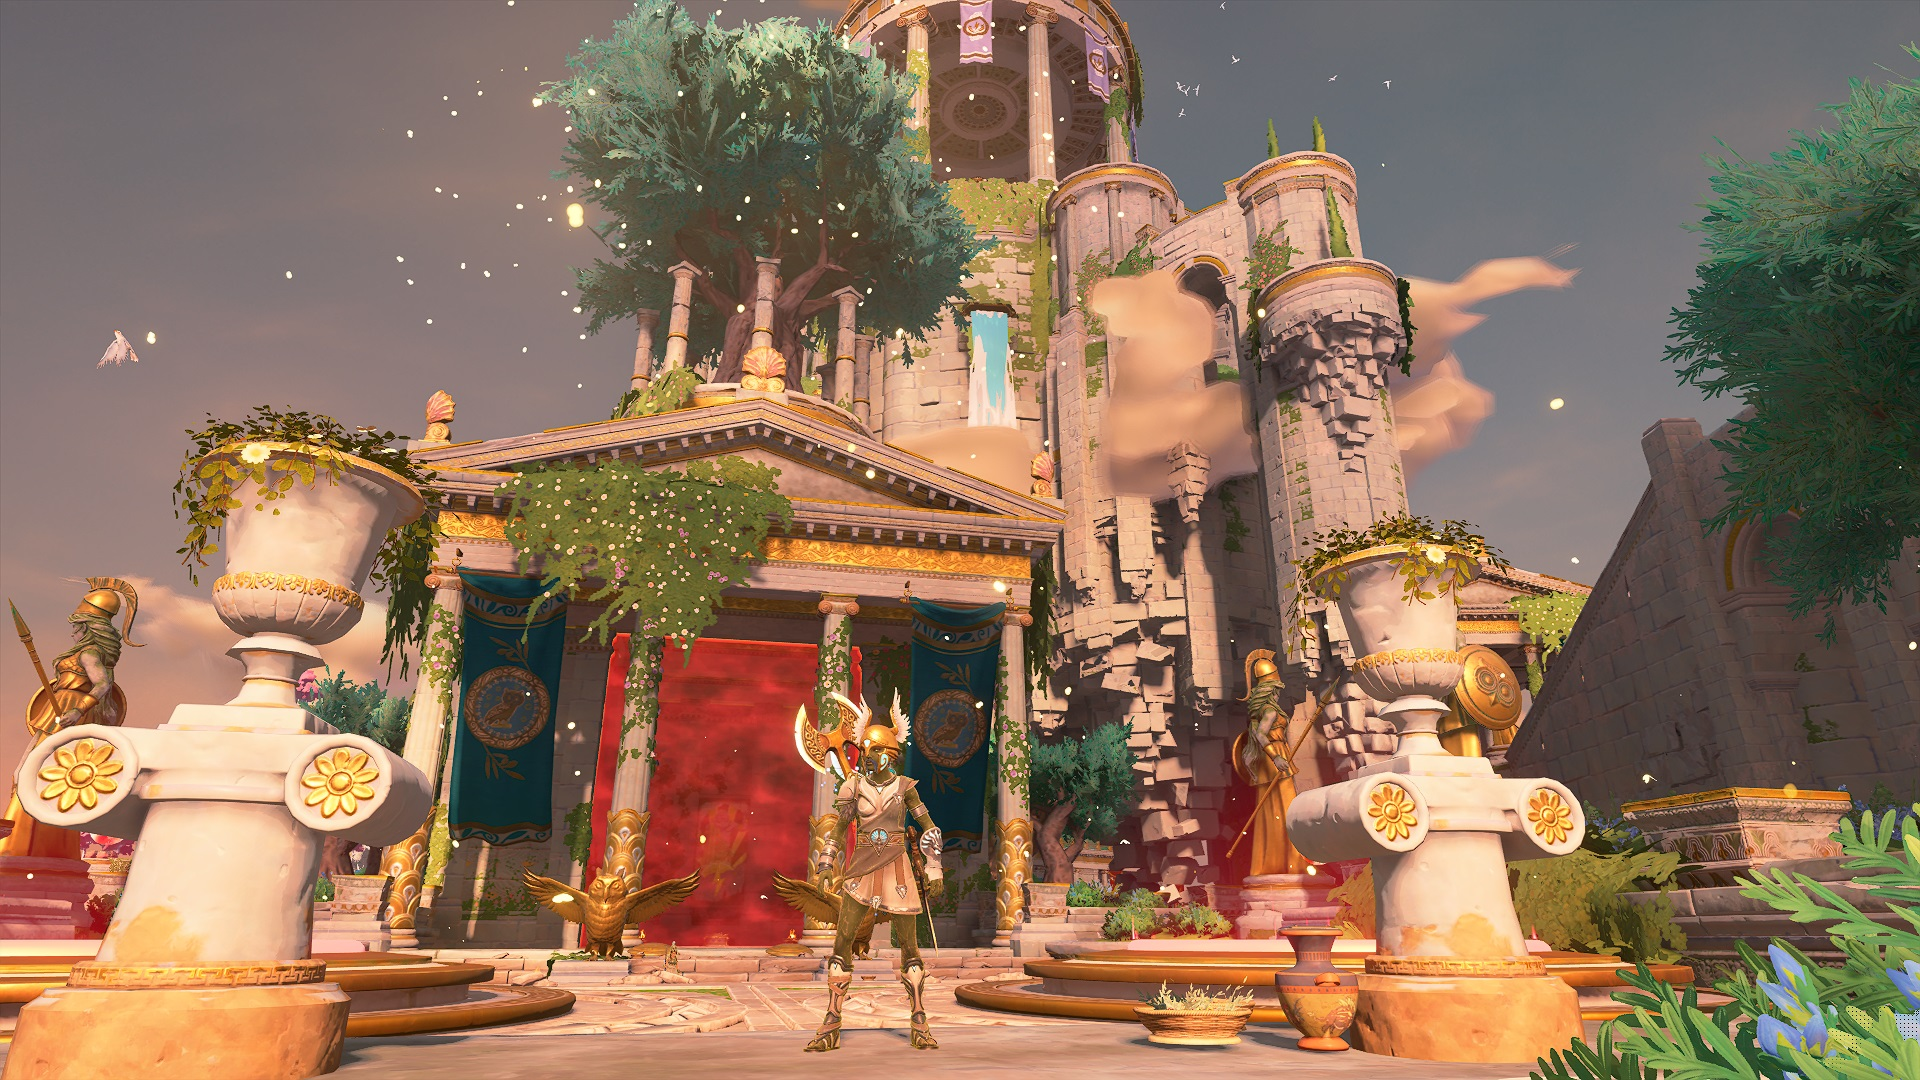 Immortals Fenyx Rising: A New God DLC impressions - The road to godliness    Shacknews